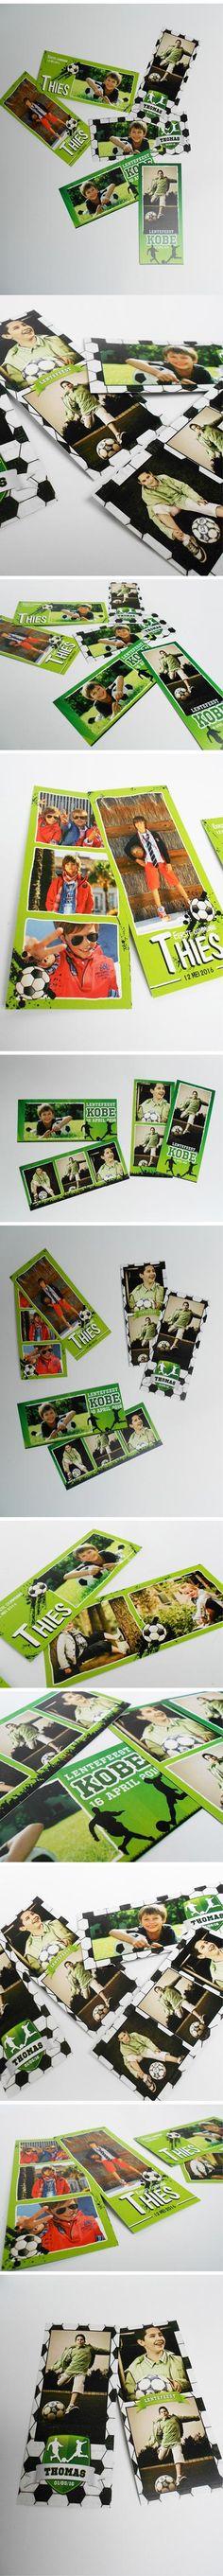 #communiekaartjes met voetbal designs